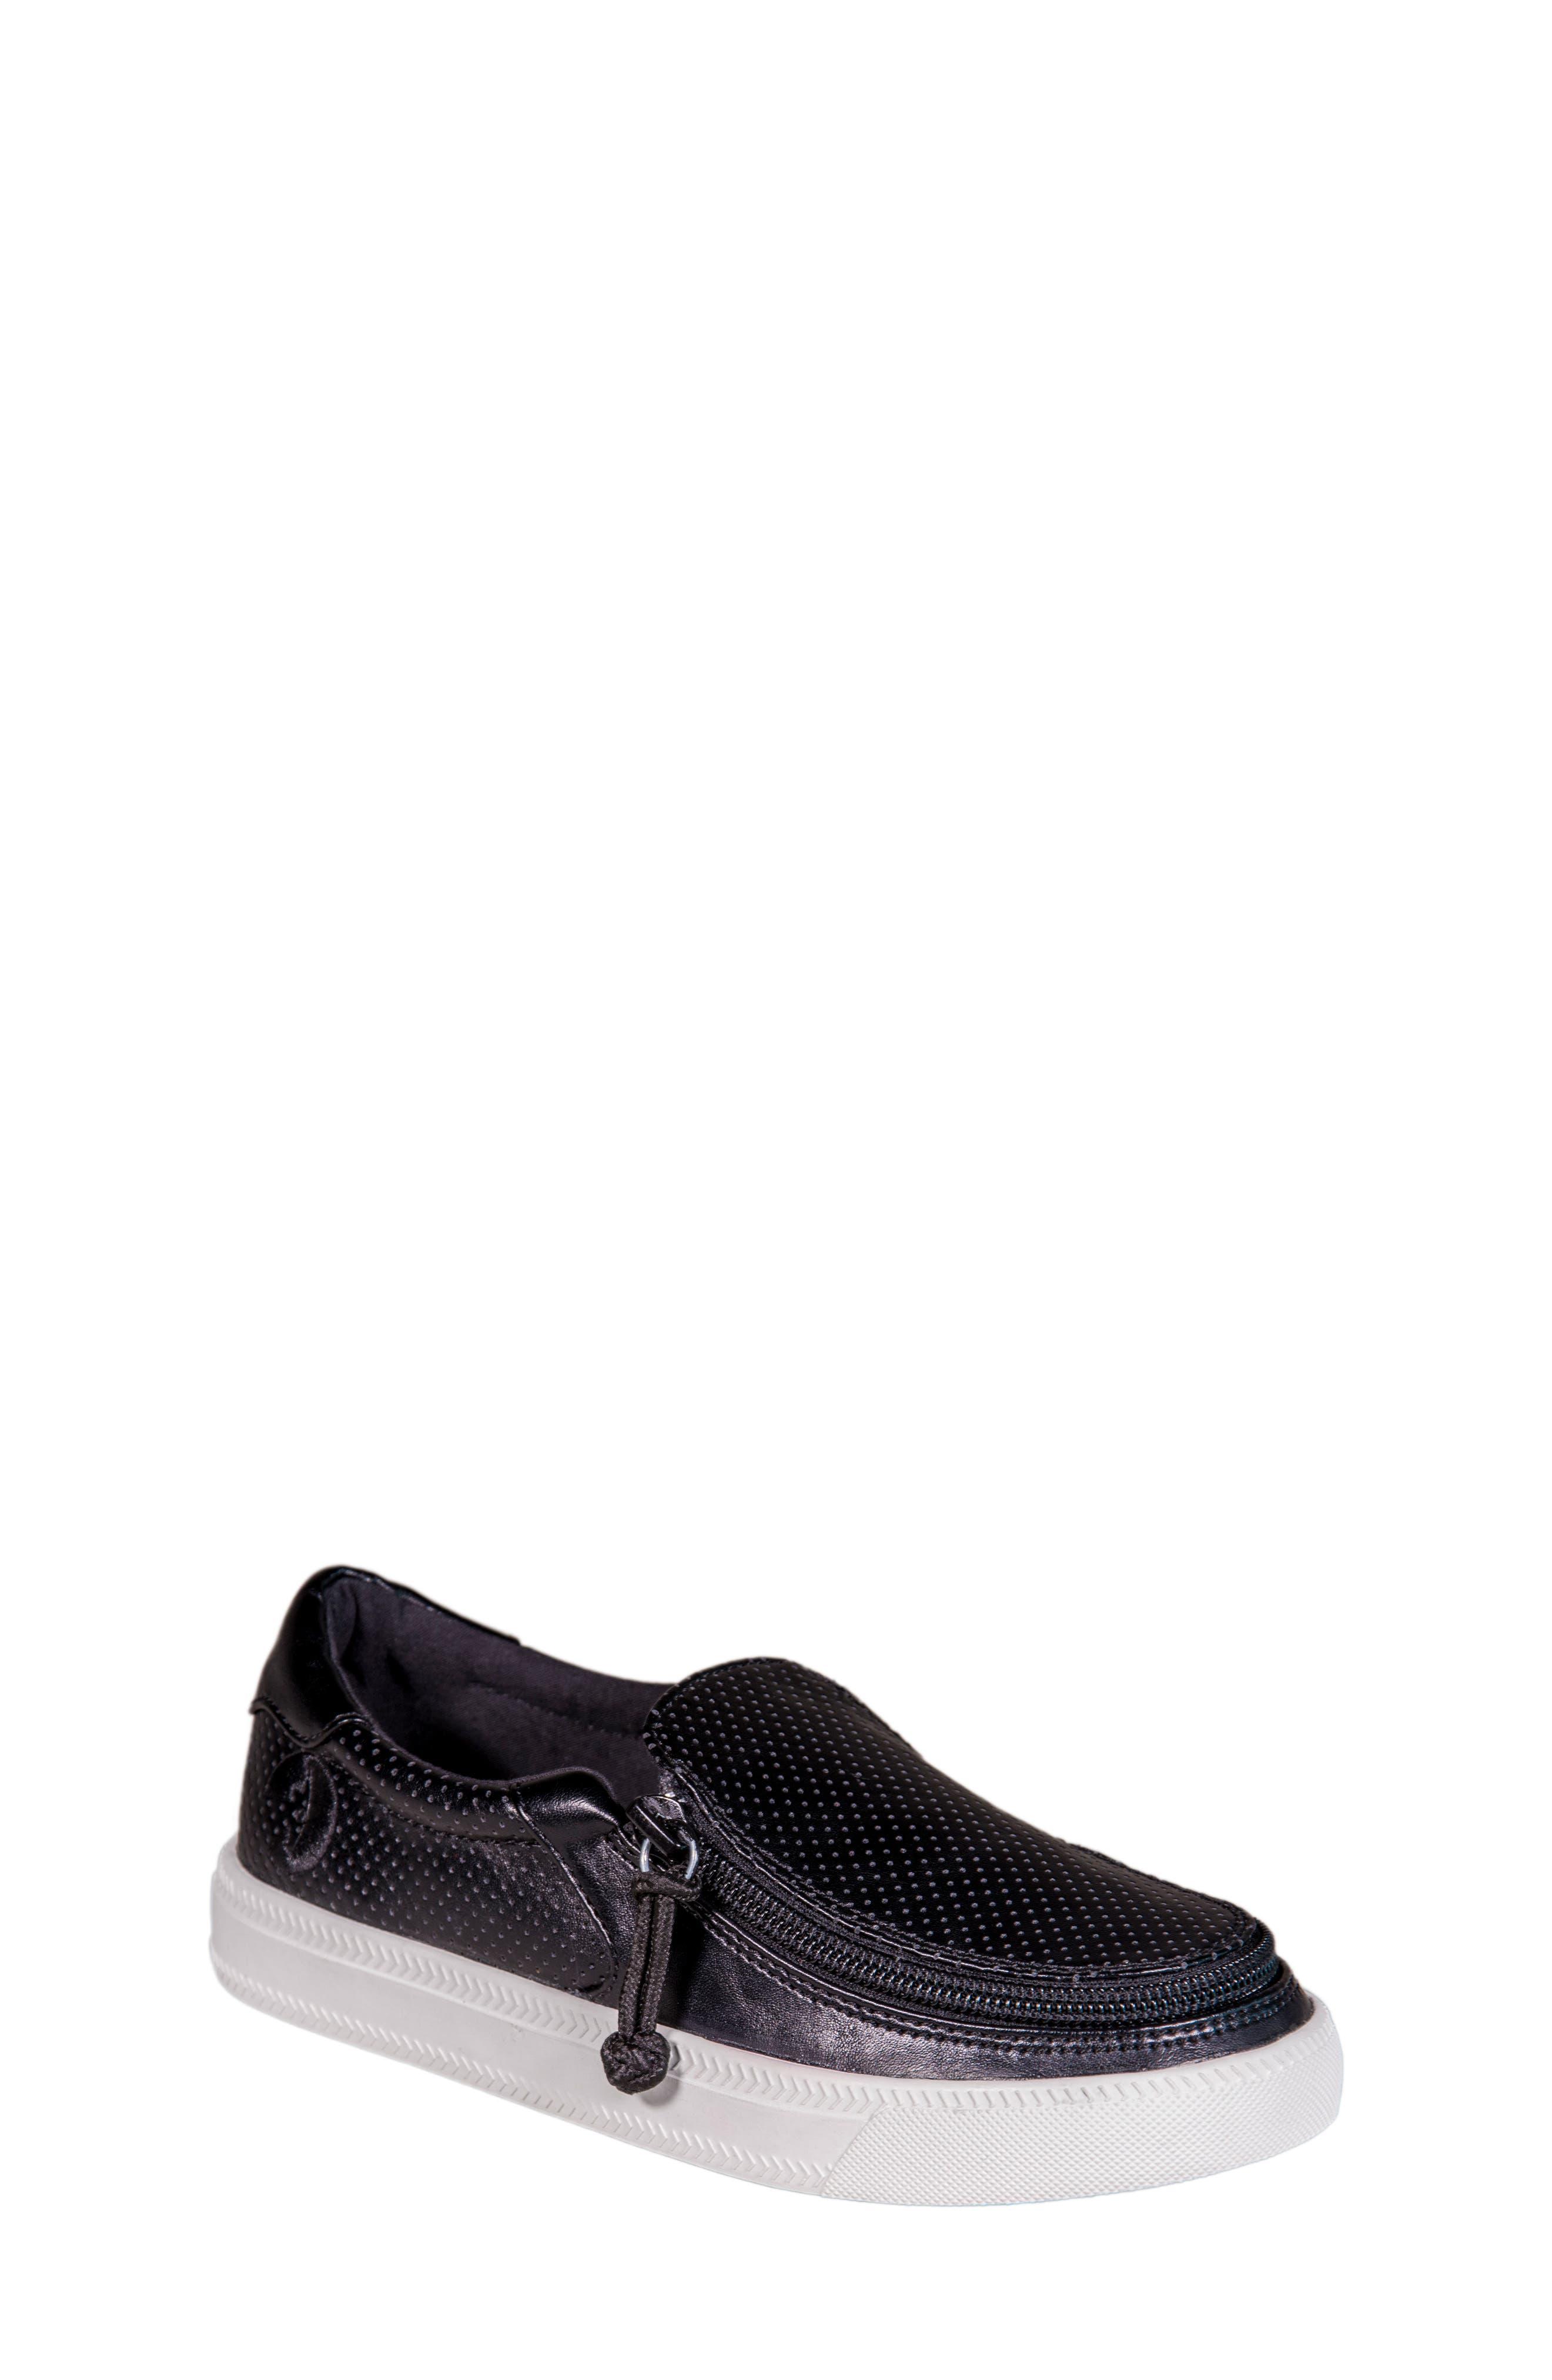 Zip Around Perforated Low Top Sneaker,                         Main,                         color,